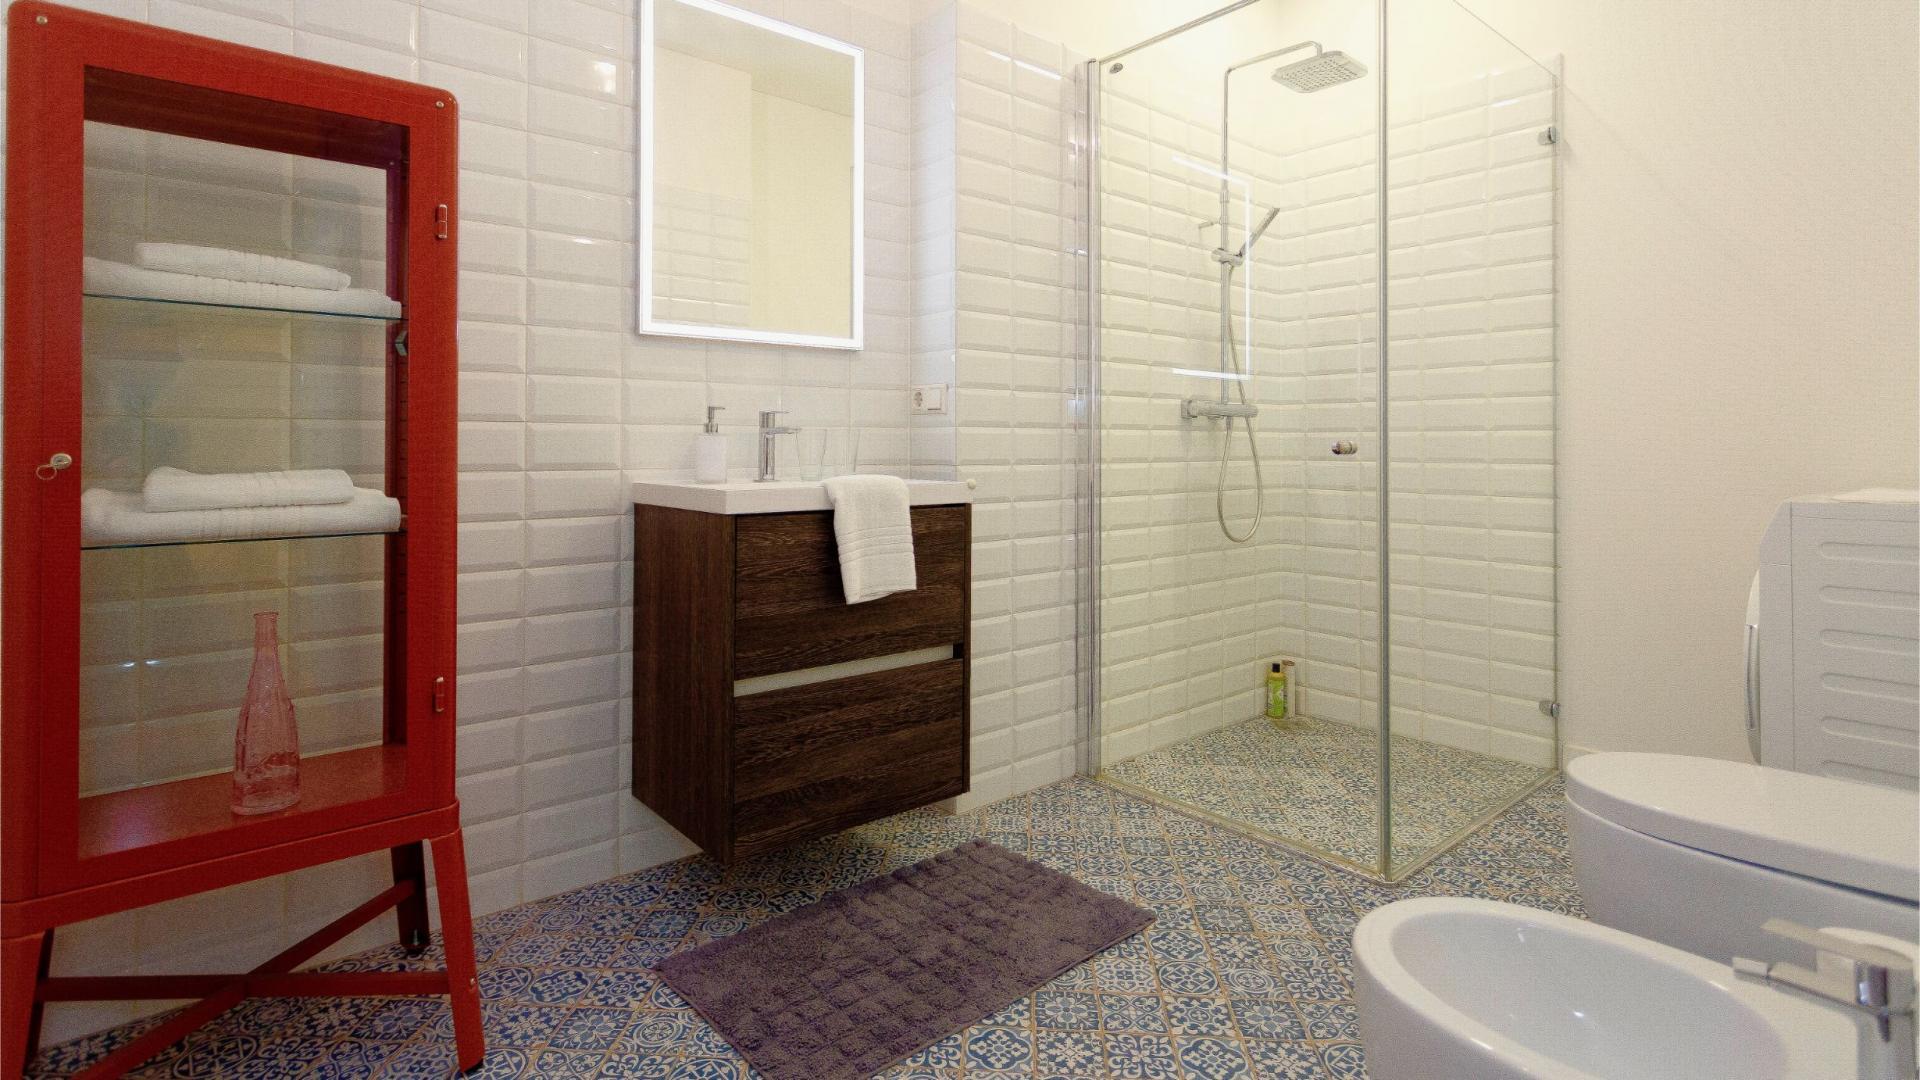 Shower at Siauliu Town Hall Apartment